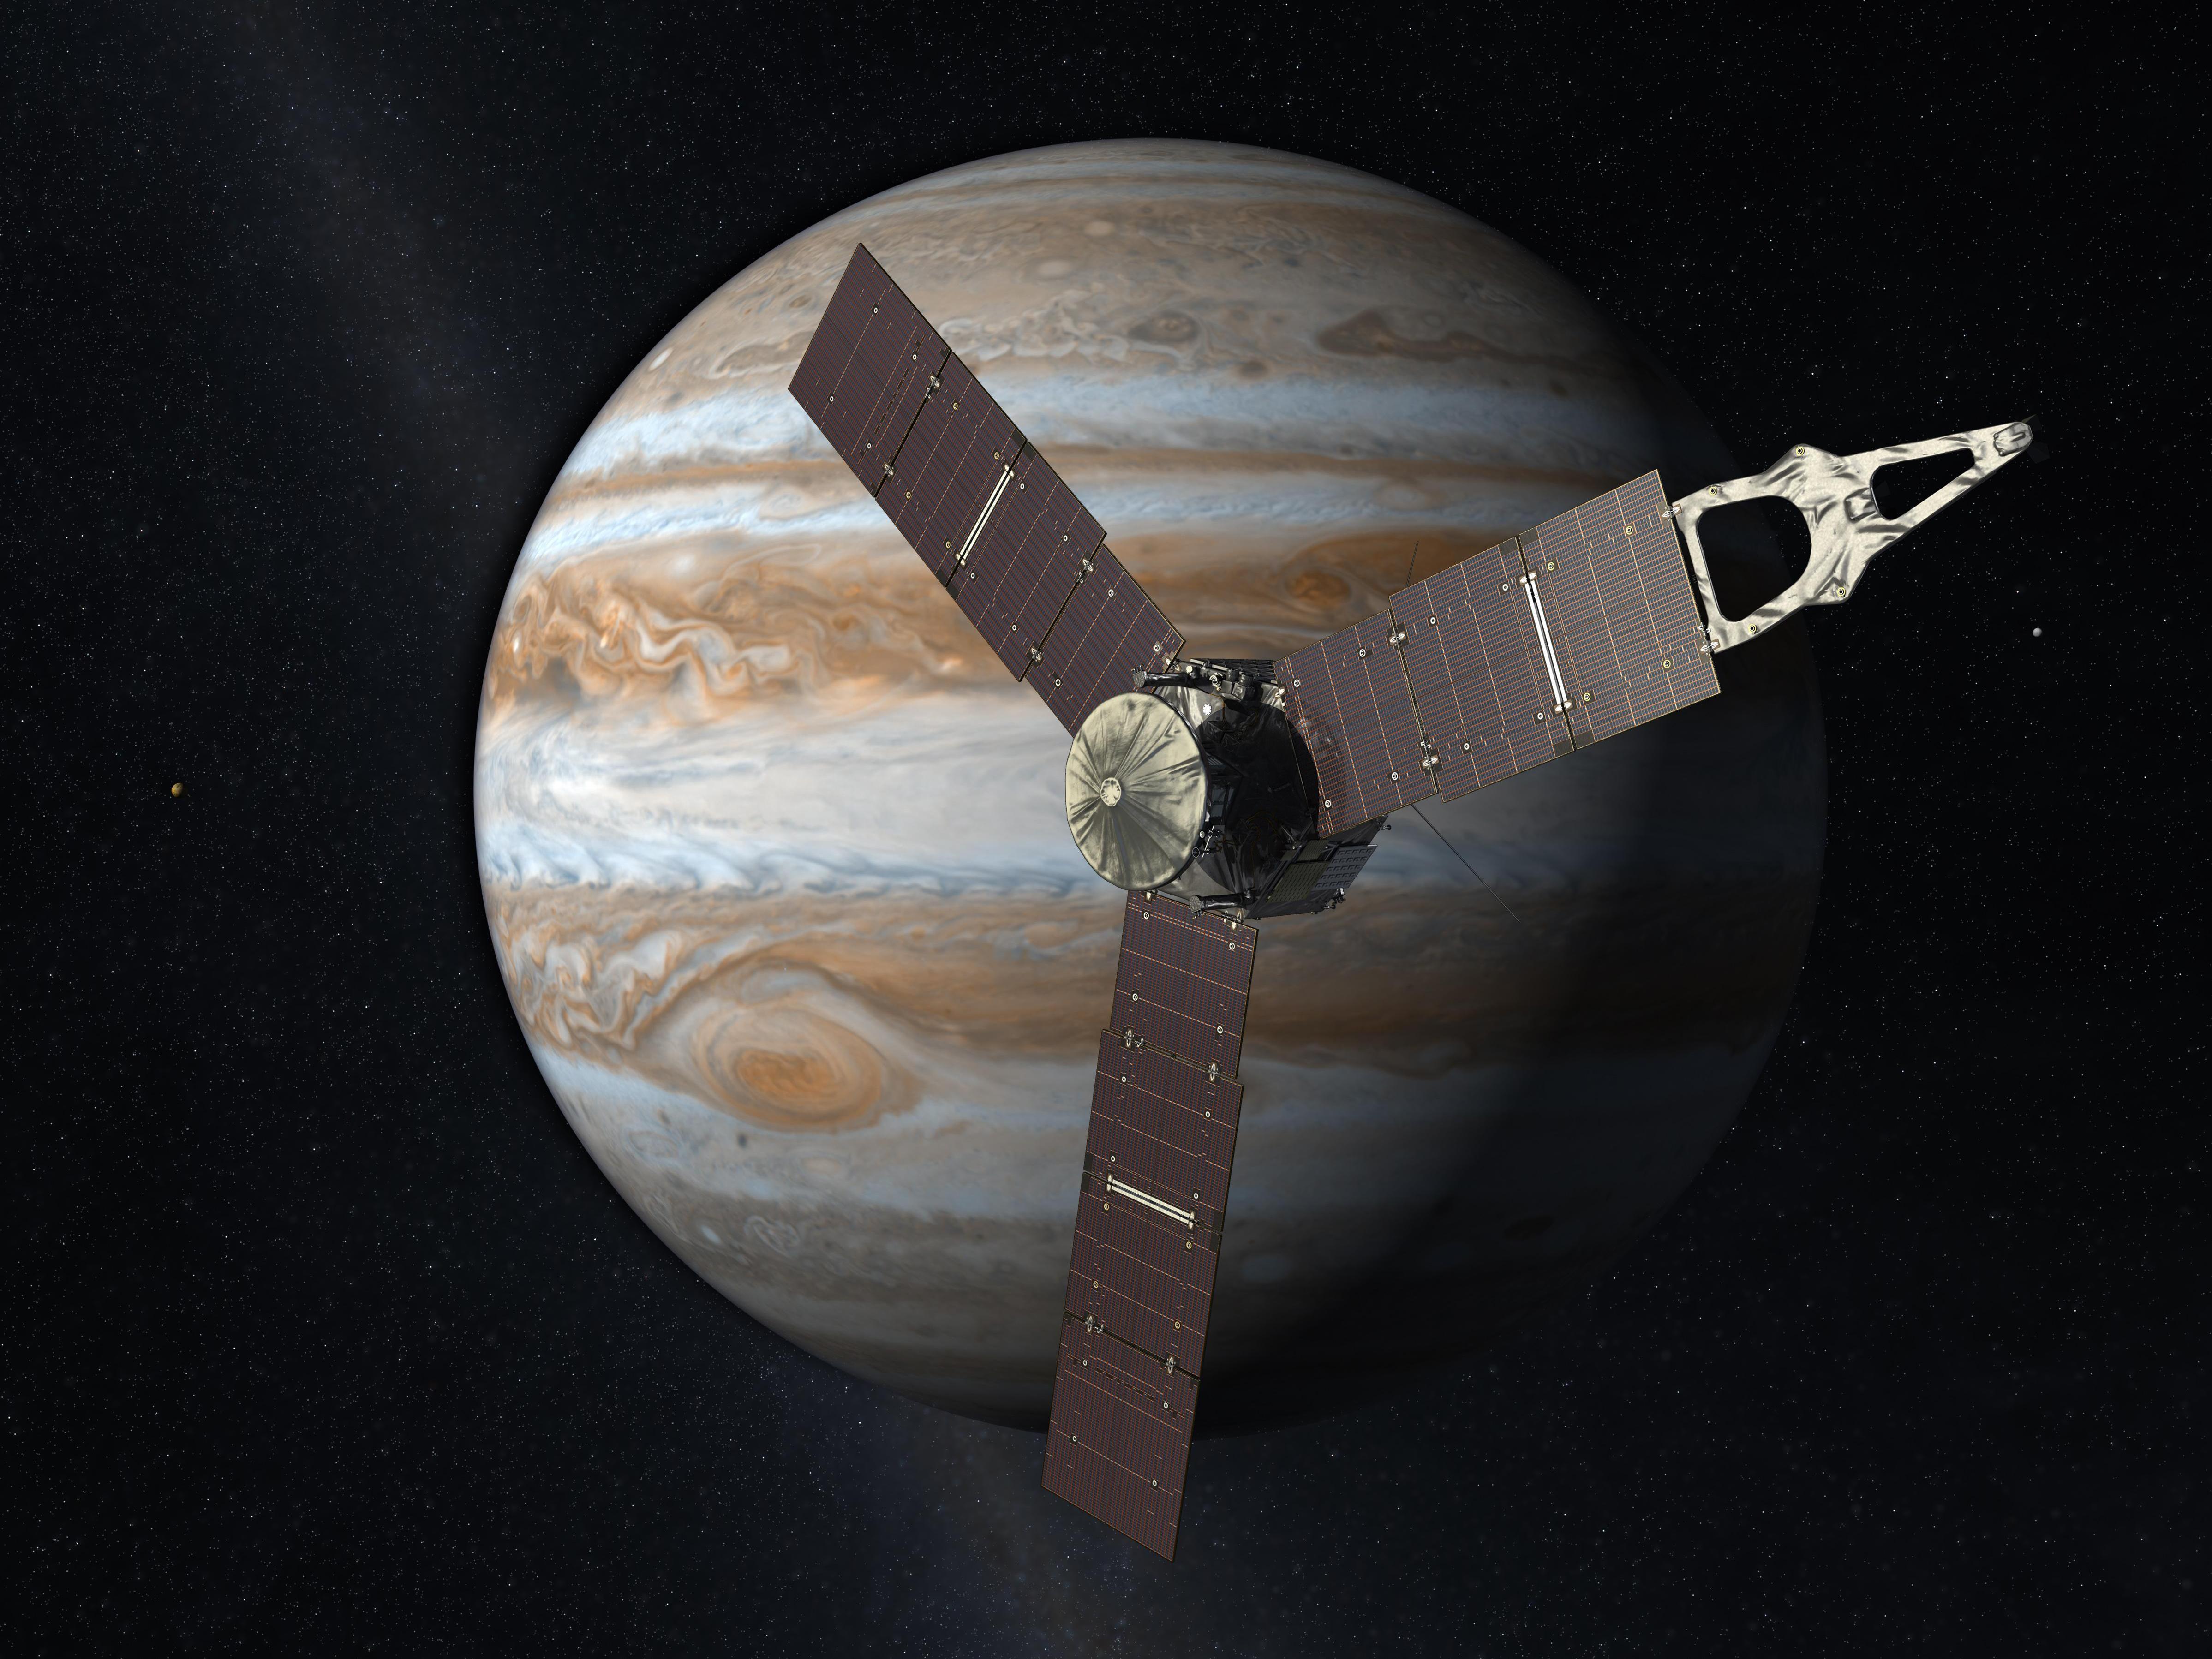 Juno Probe NASA - Juno Reaches Jupiter